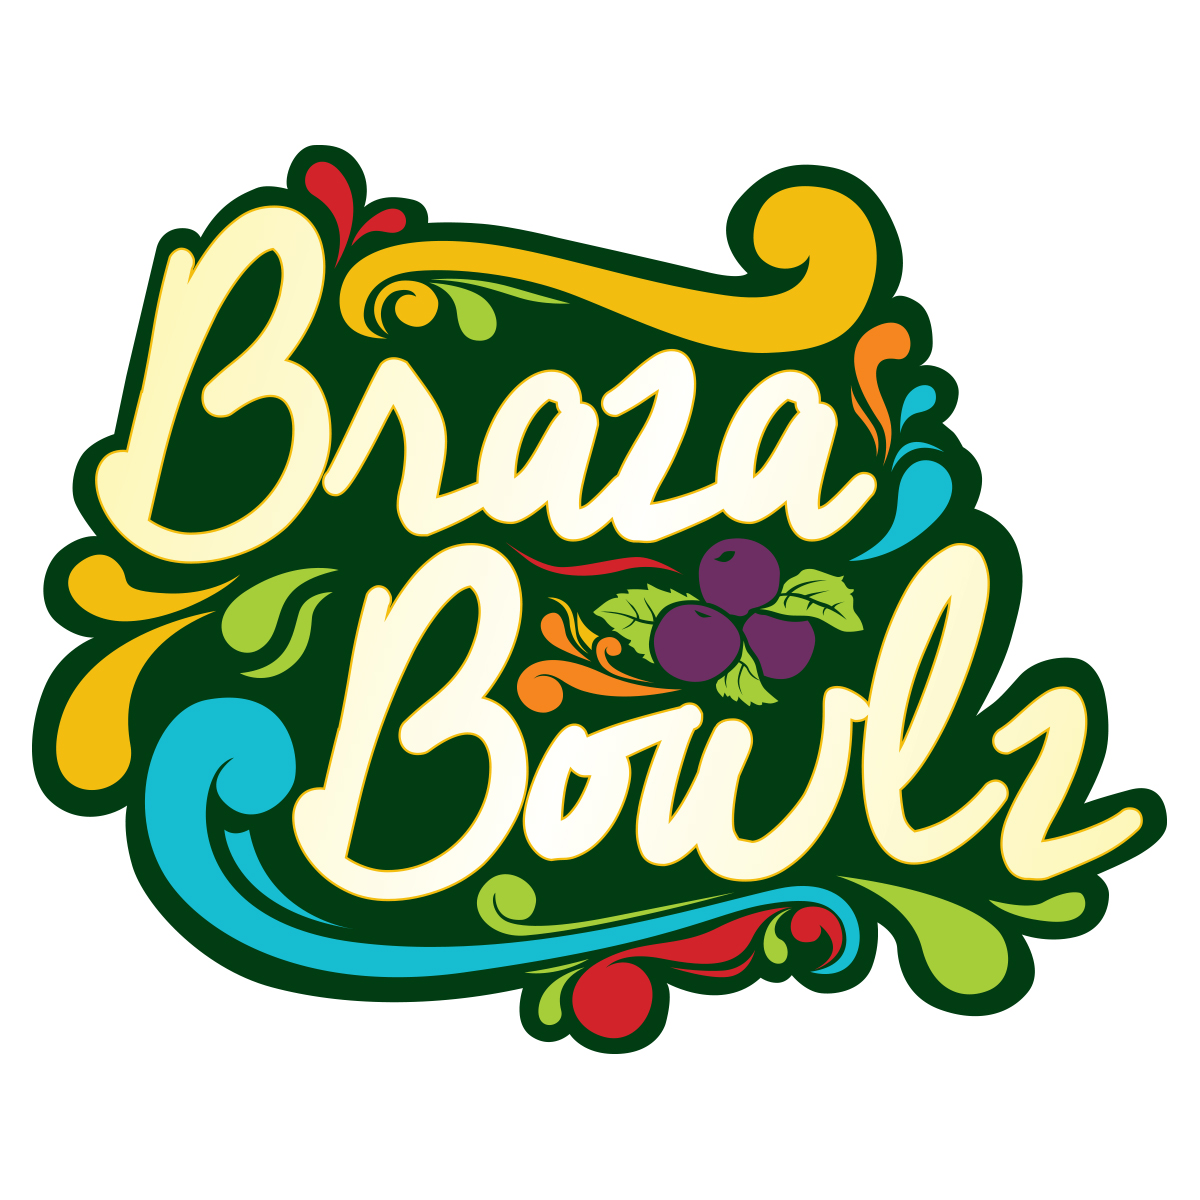 Braza Bowlz_FB profile pic.jpg